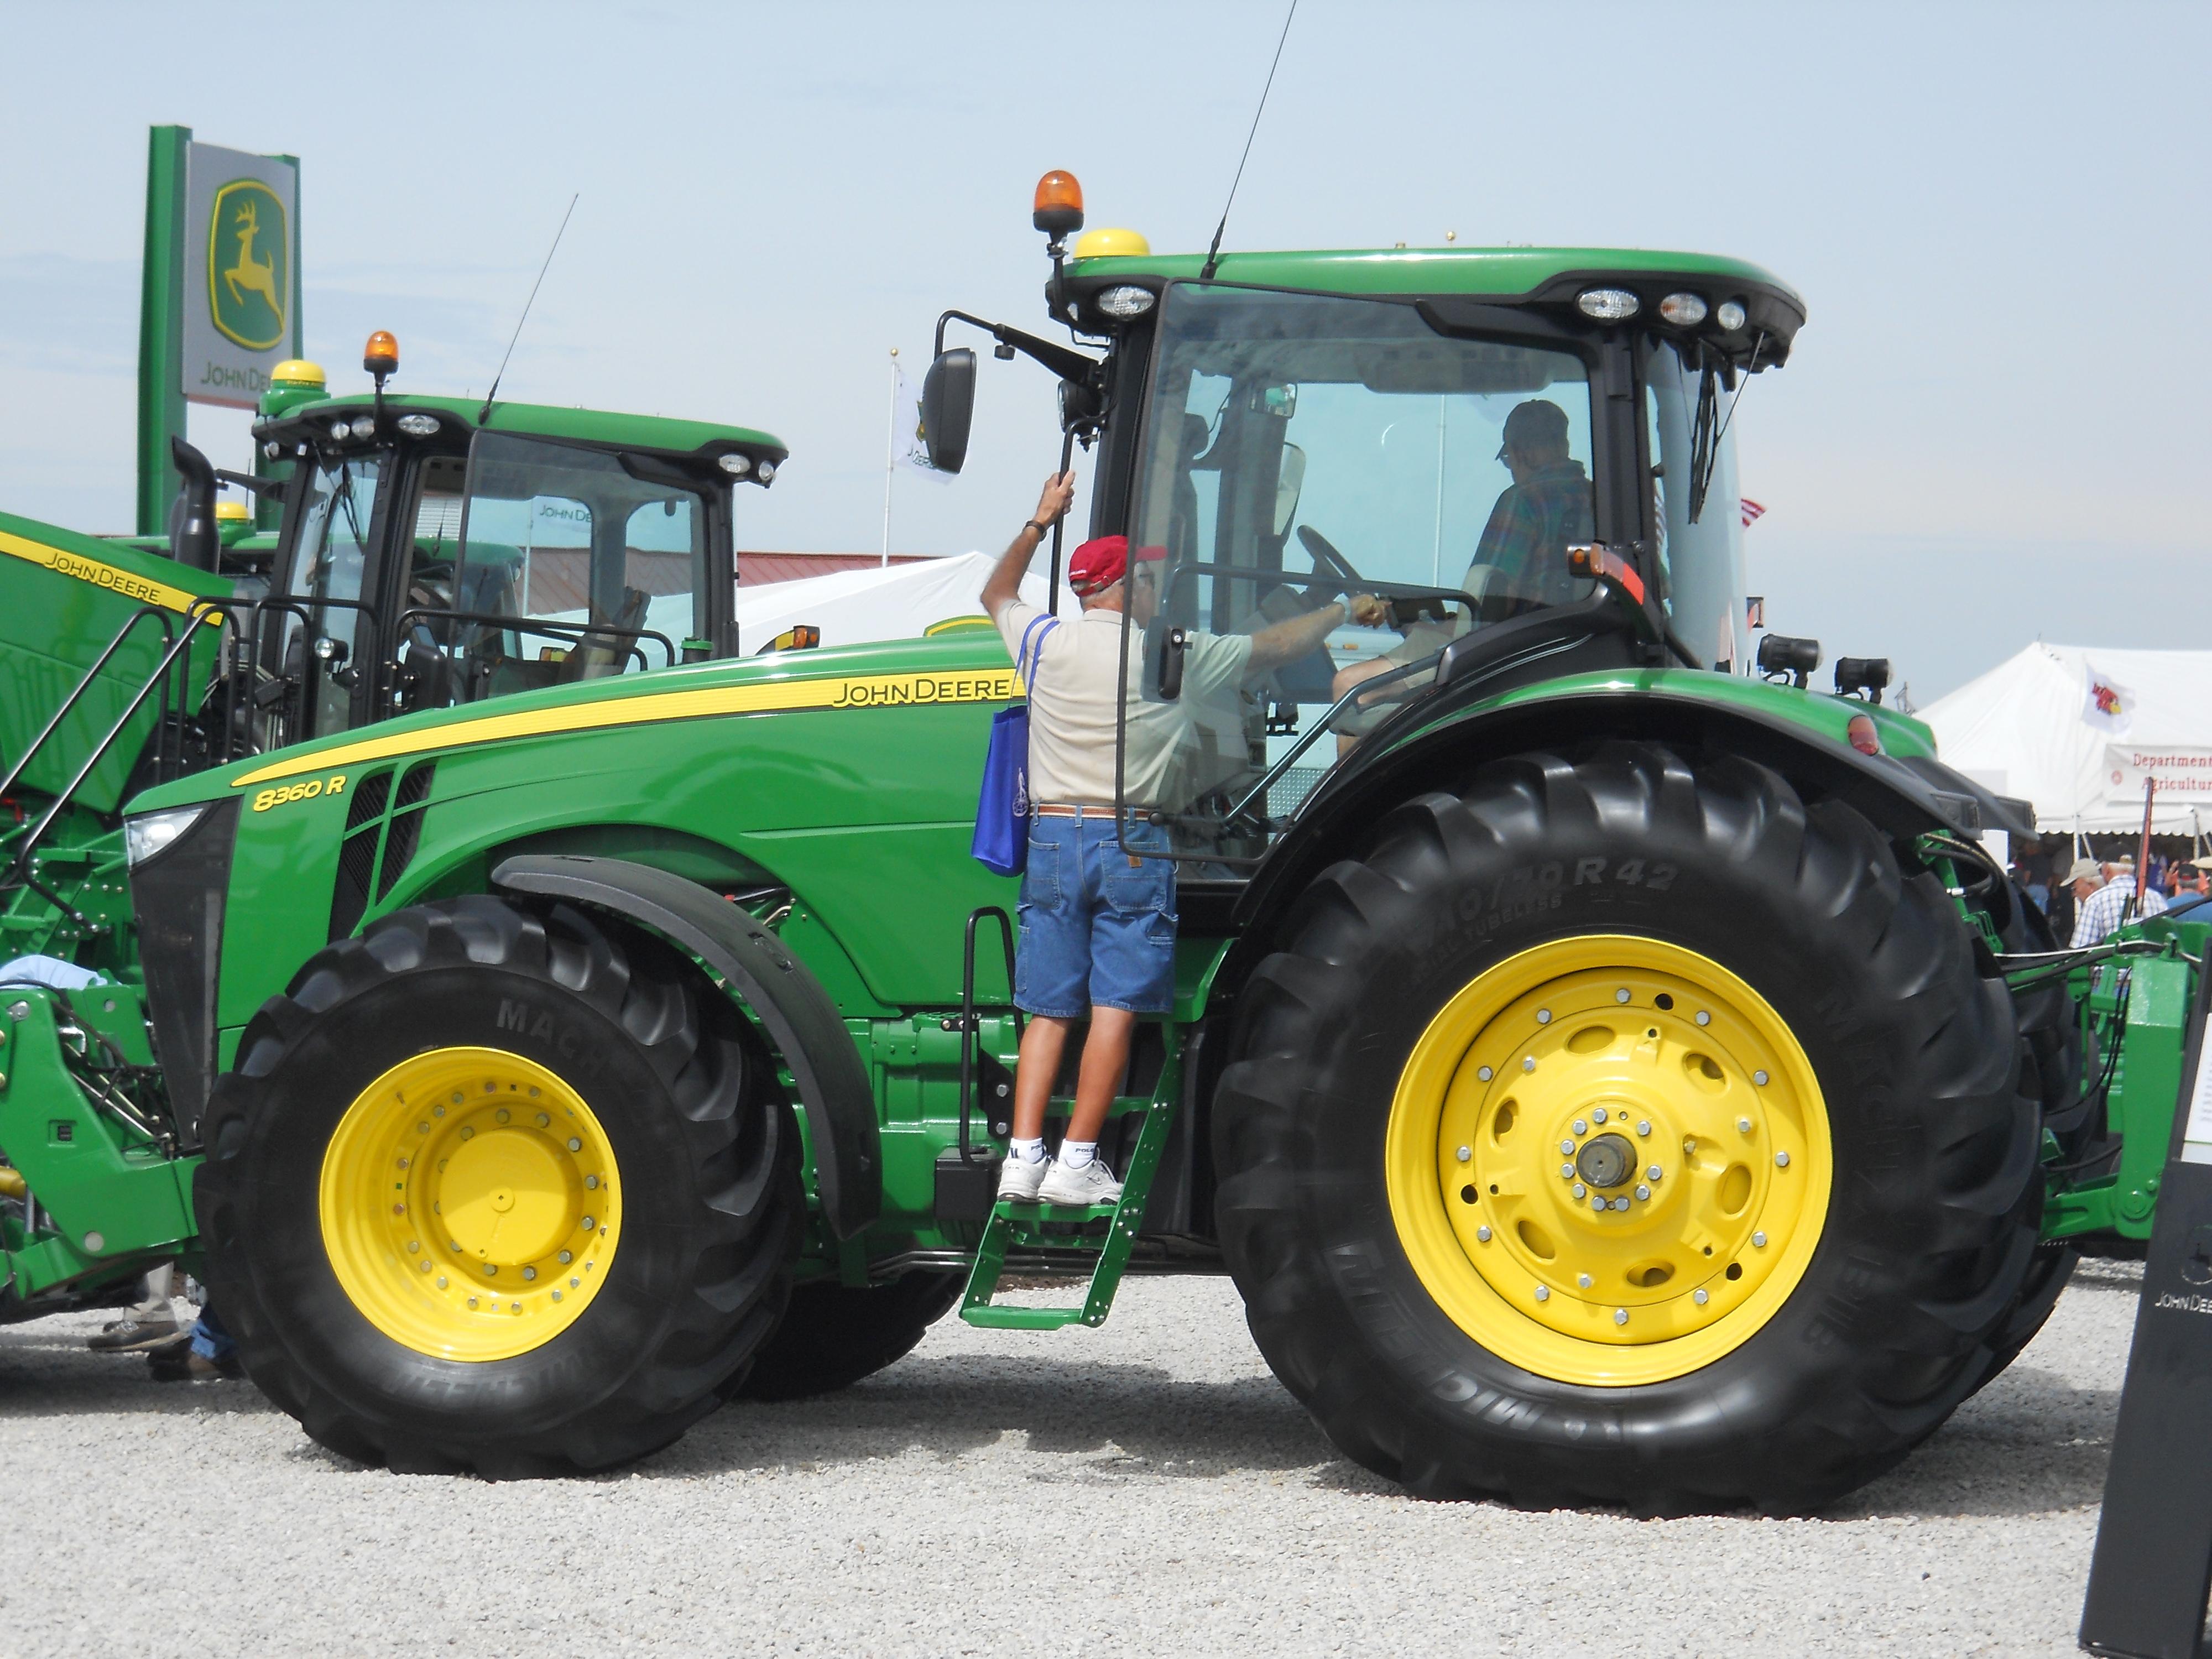 john deere 8360 r - tractor & construction plant wiki